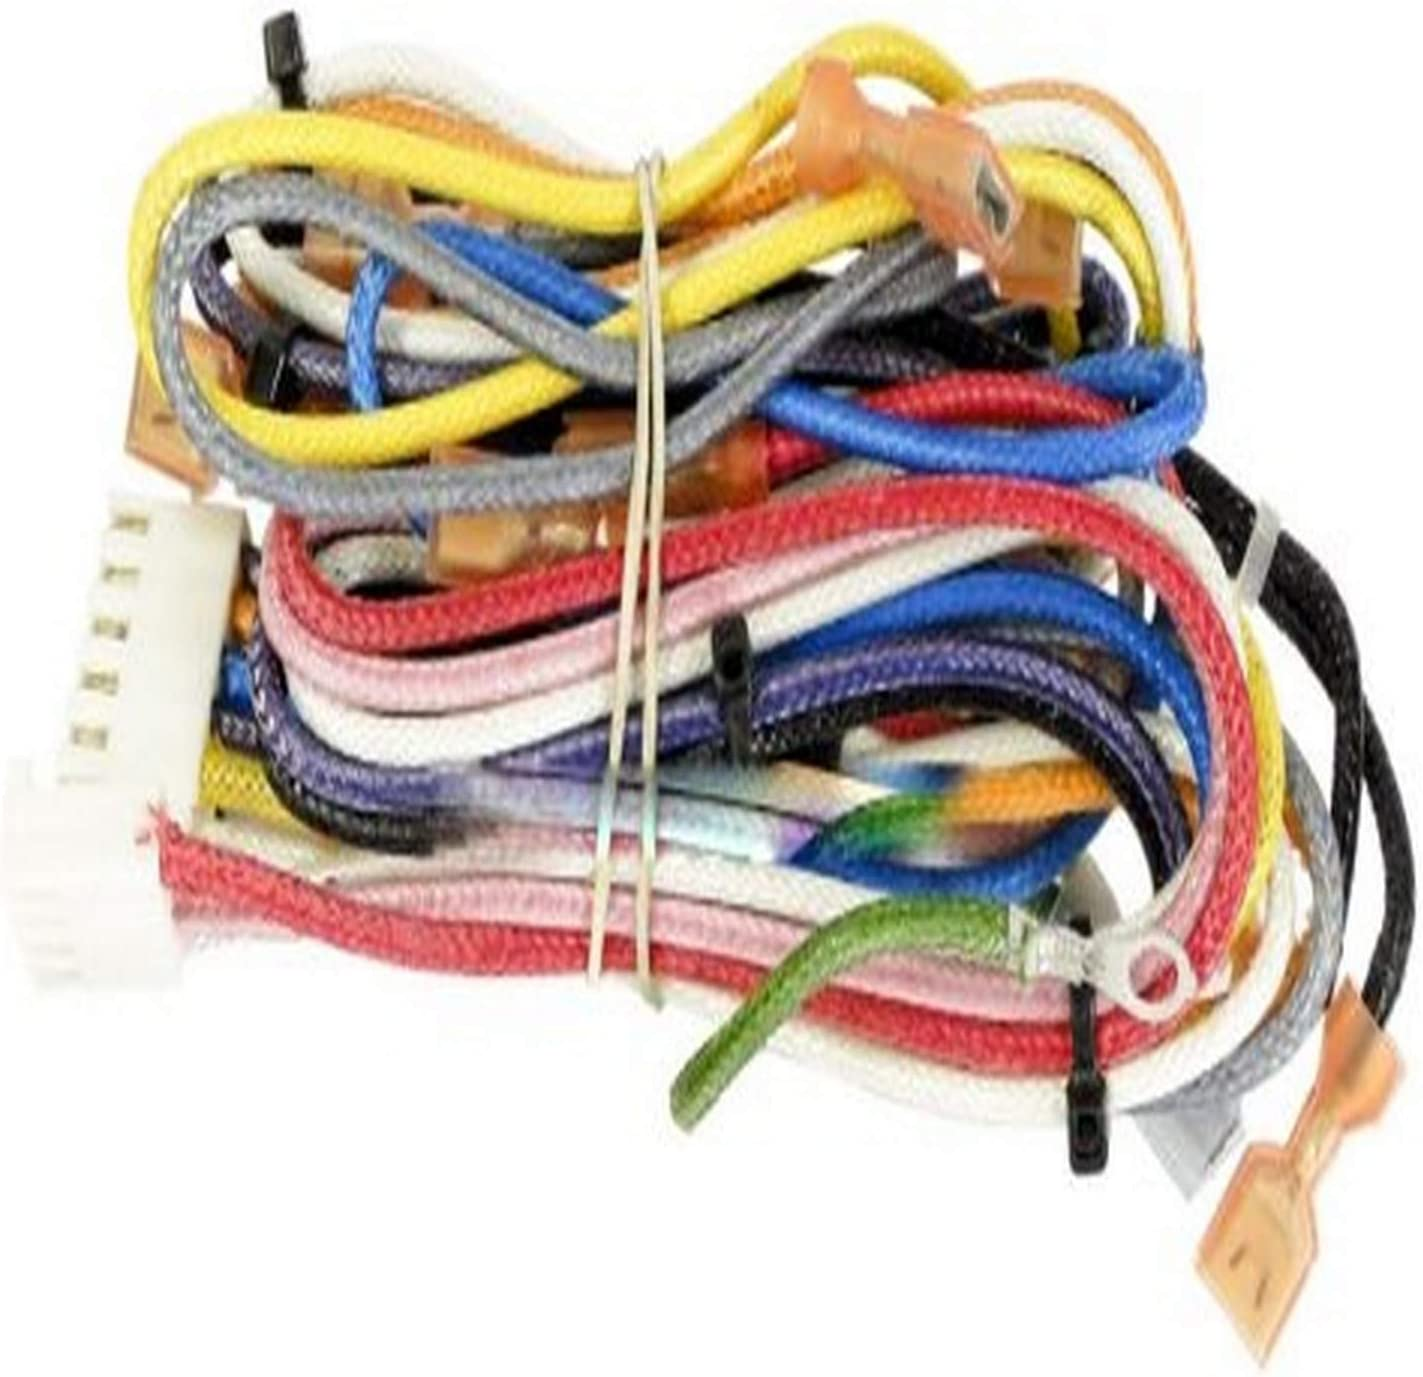 amazon.com: hayward haxwha0008 main wire harness replacement for hayward  h-series ed2 style pool heater: garden & outdoor  amazon.com